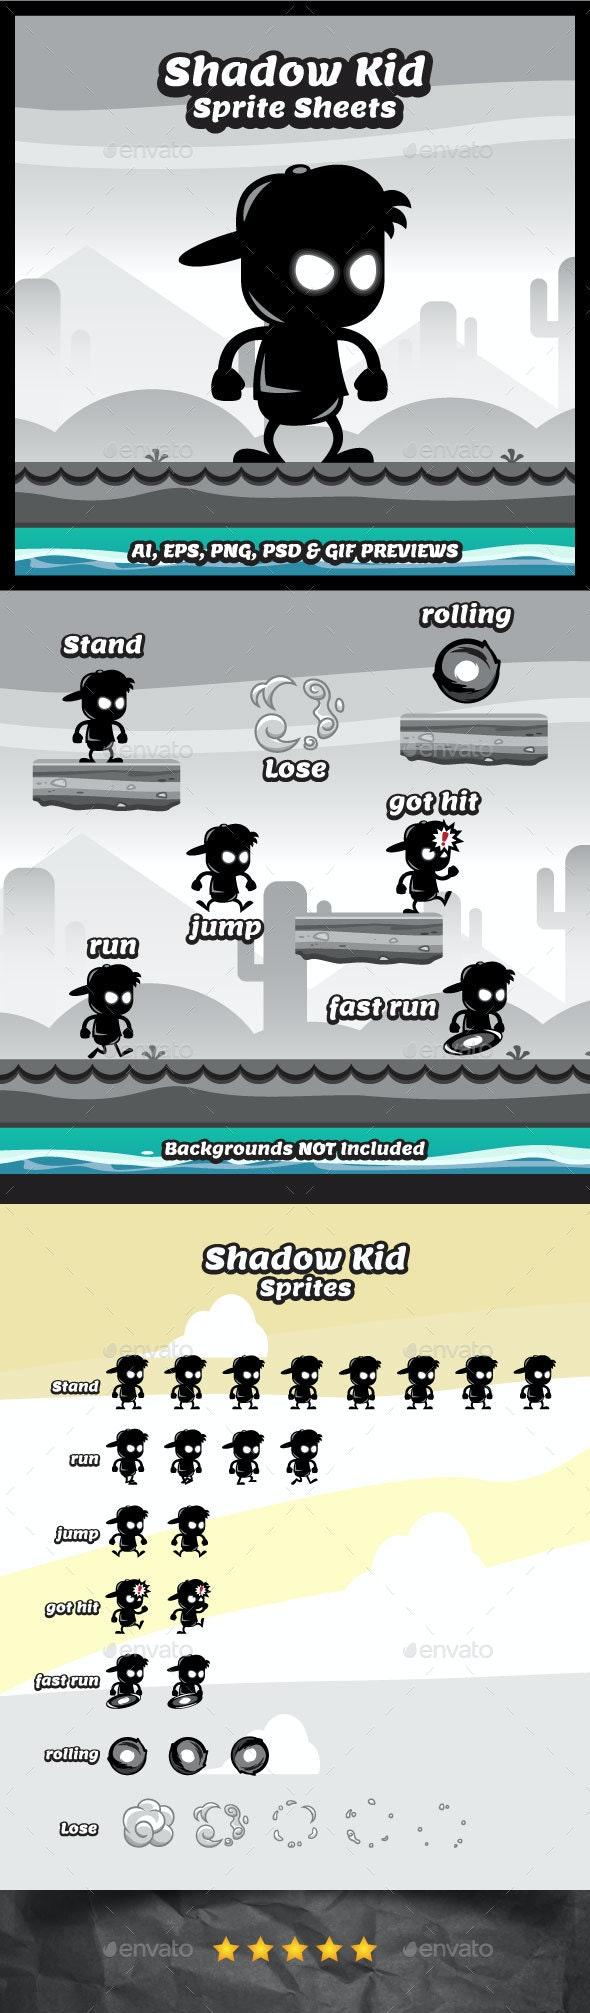 Shadow Kid Game Character